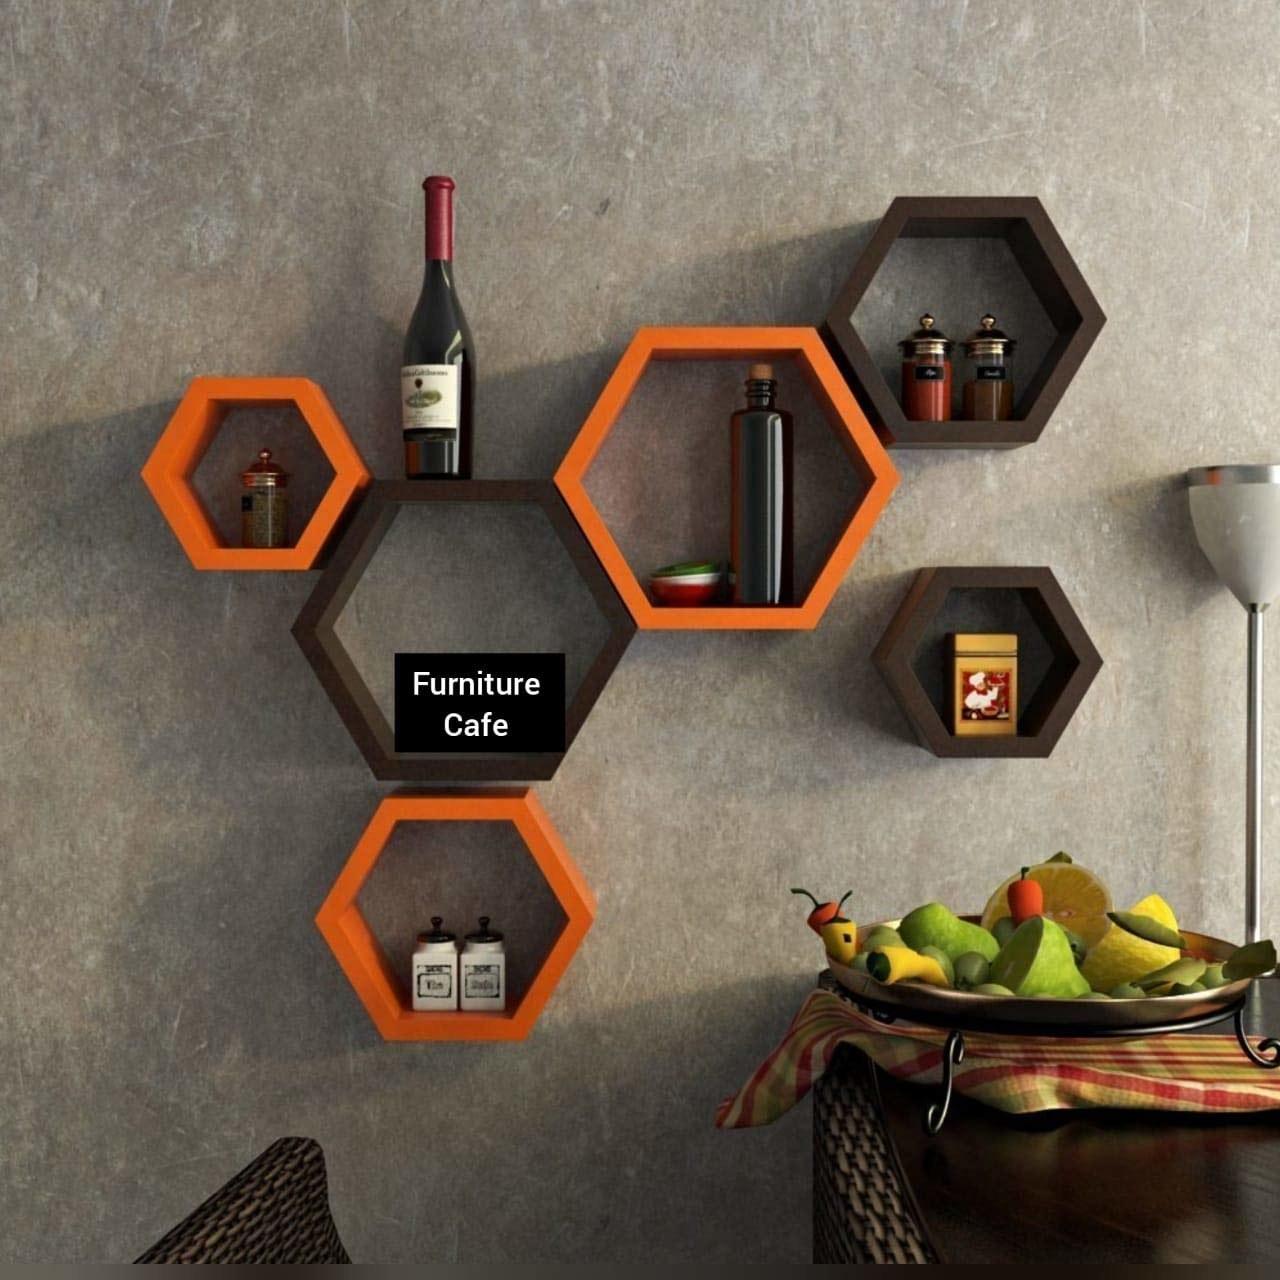 Hexagon shelves in orange and brown